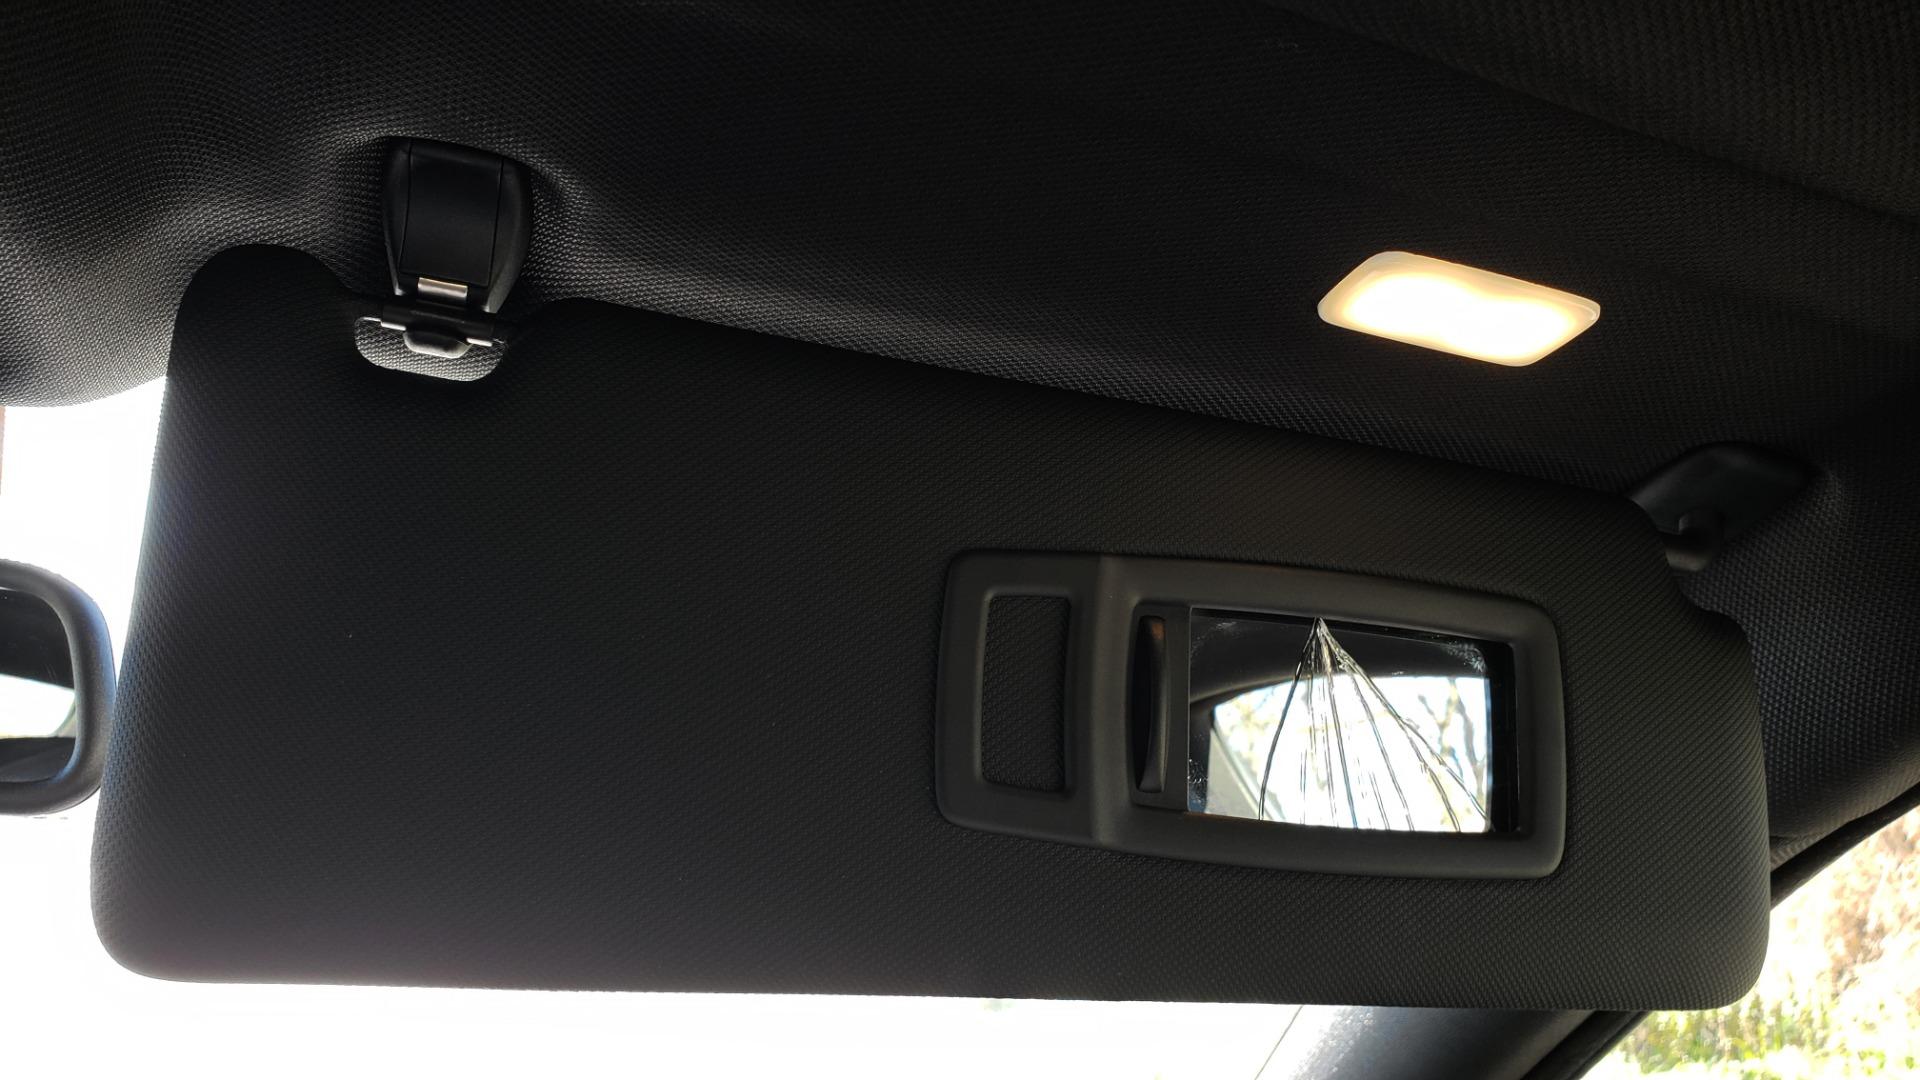 Used 2018 BMW M4 COMP PKG / EXEC / M-DRIVER / PARK CNTRL / ACTIVE BLIND SPOT for sale Sold at Formula Imports in Charlotte NC 28227 55